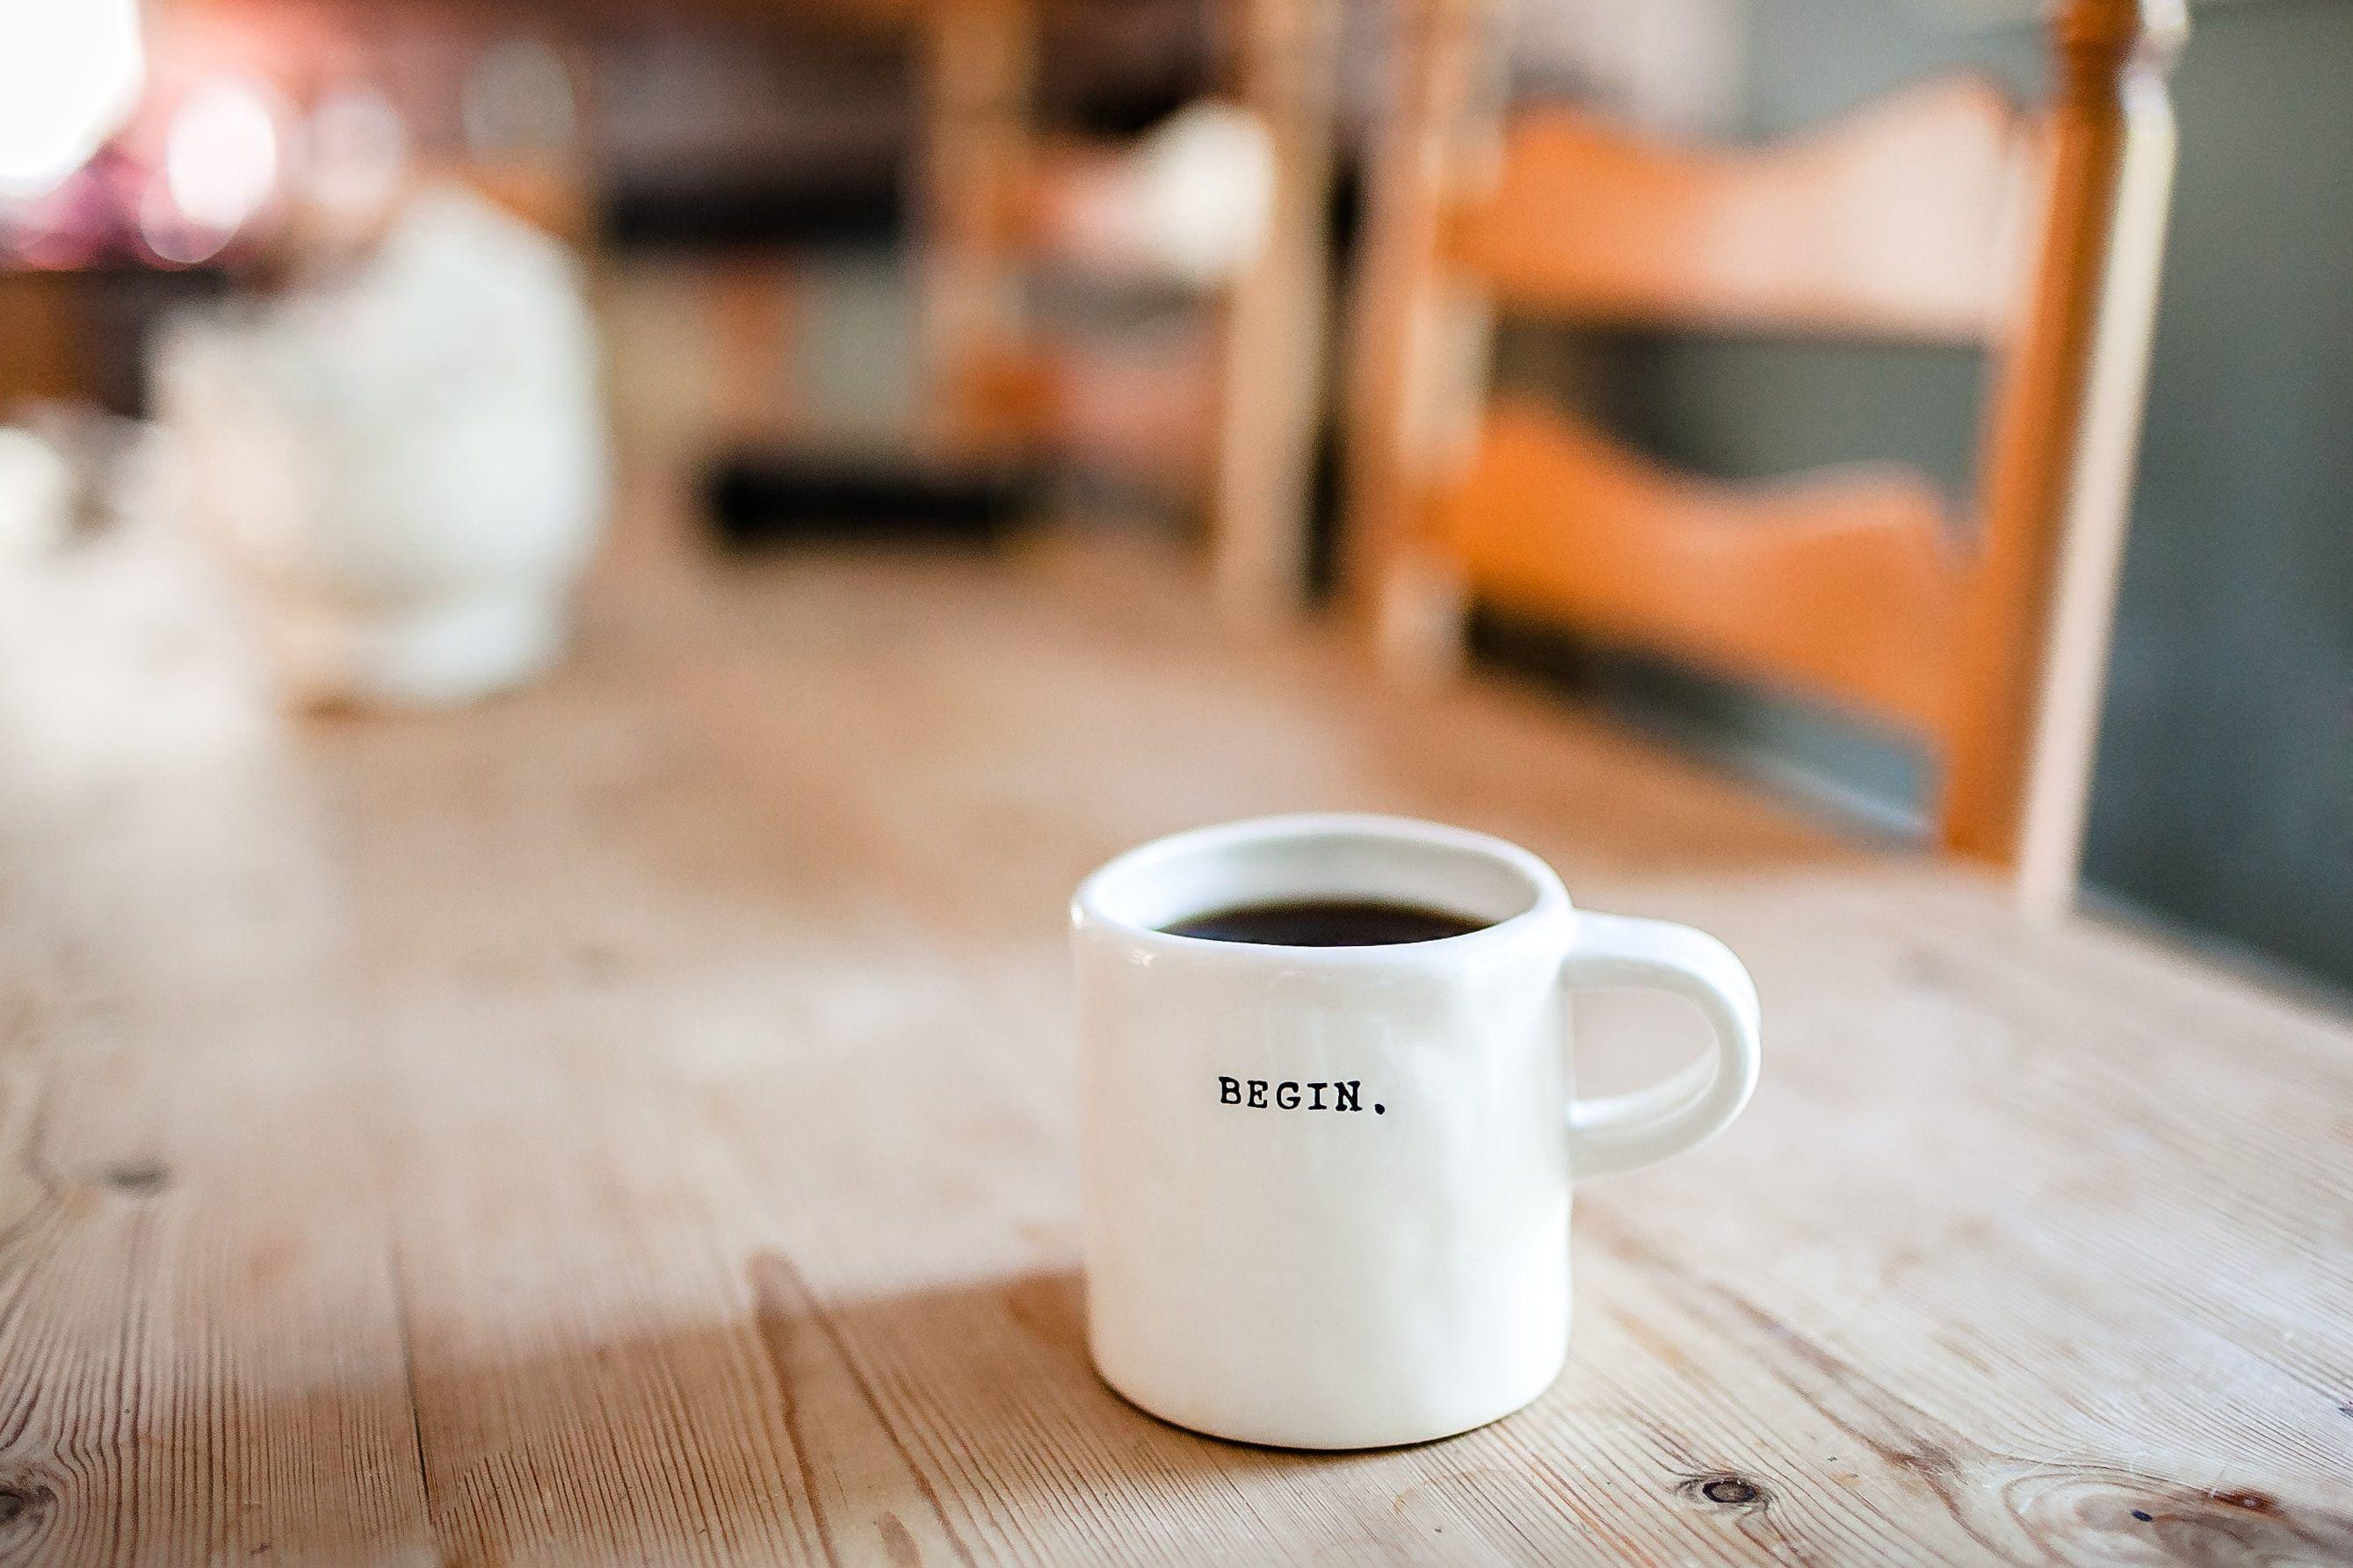 Begin mug on a table